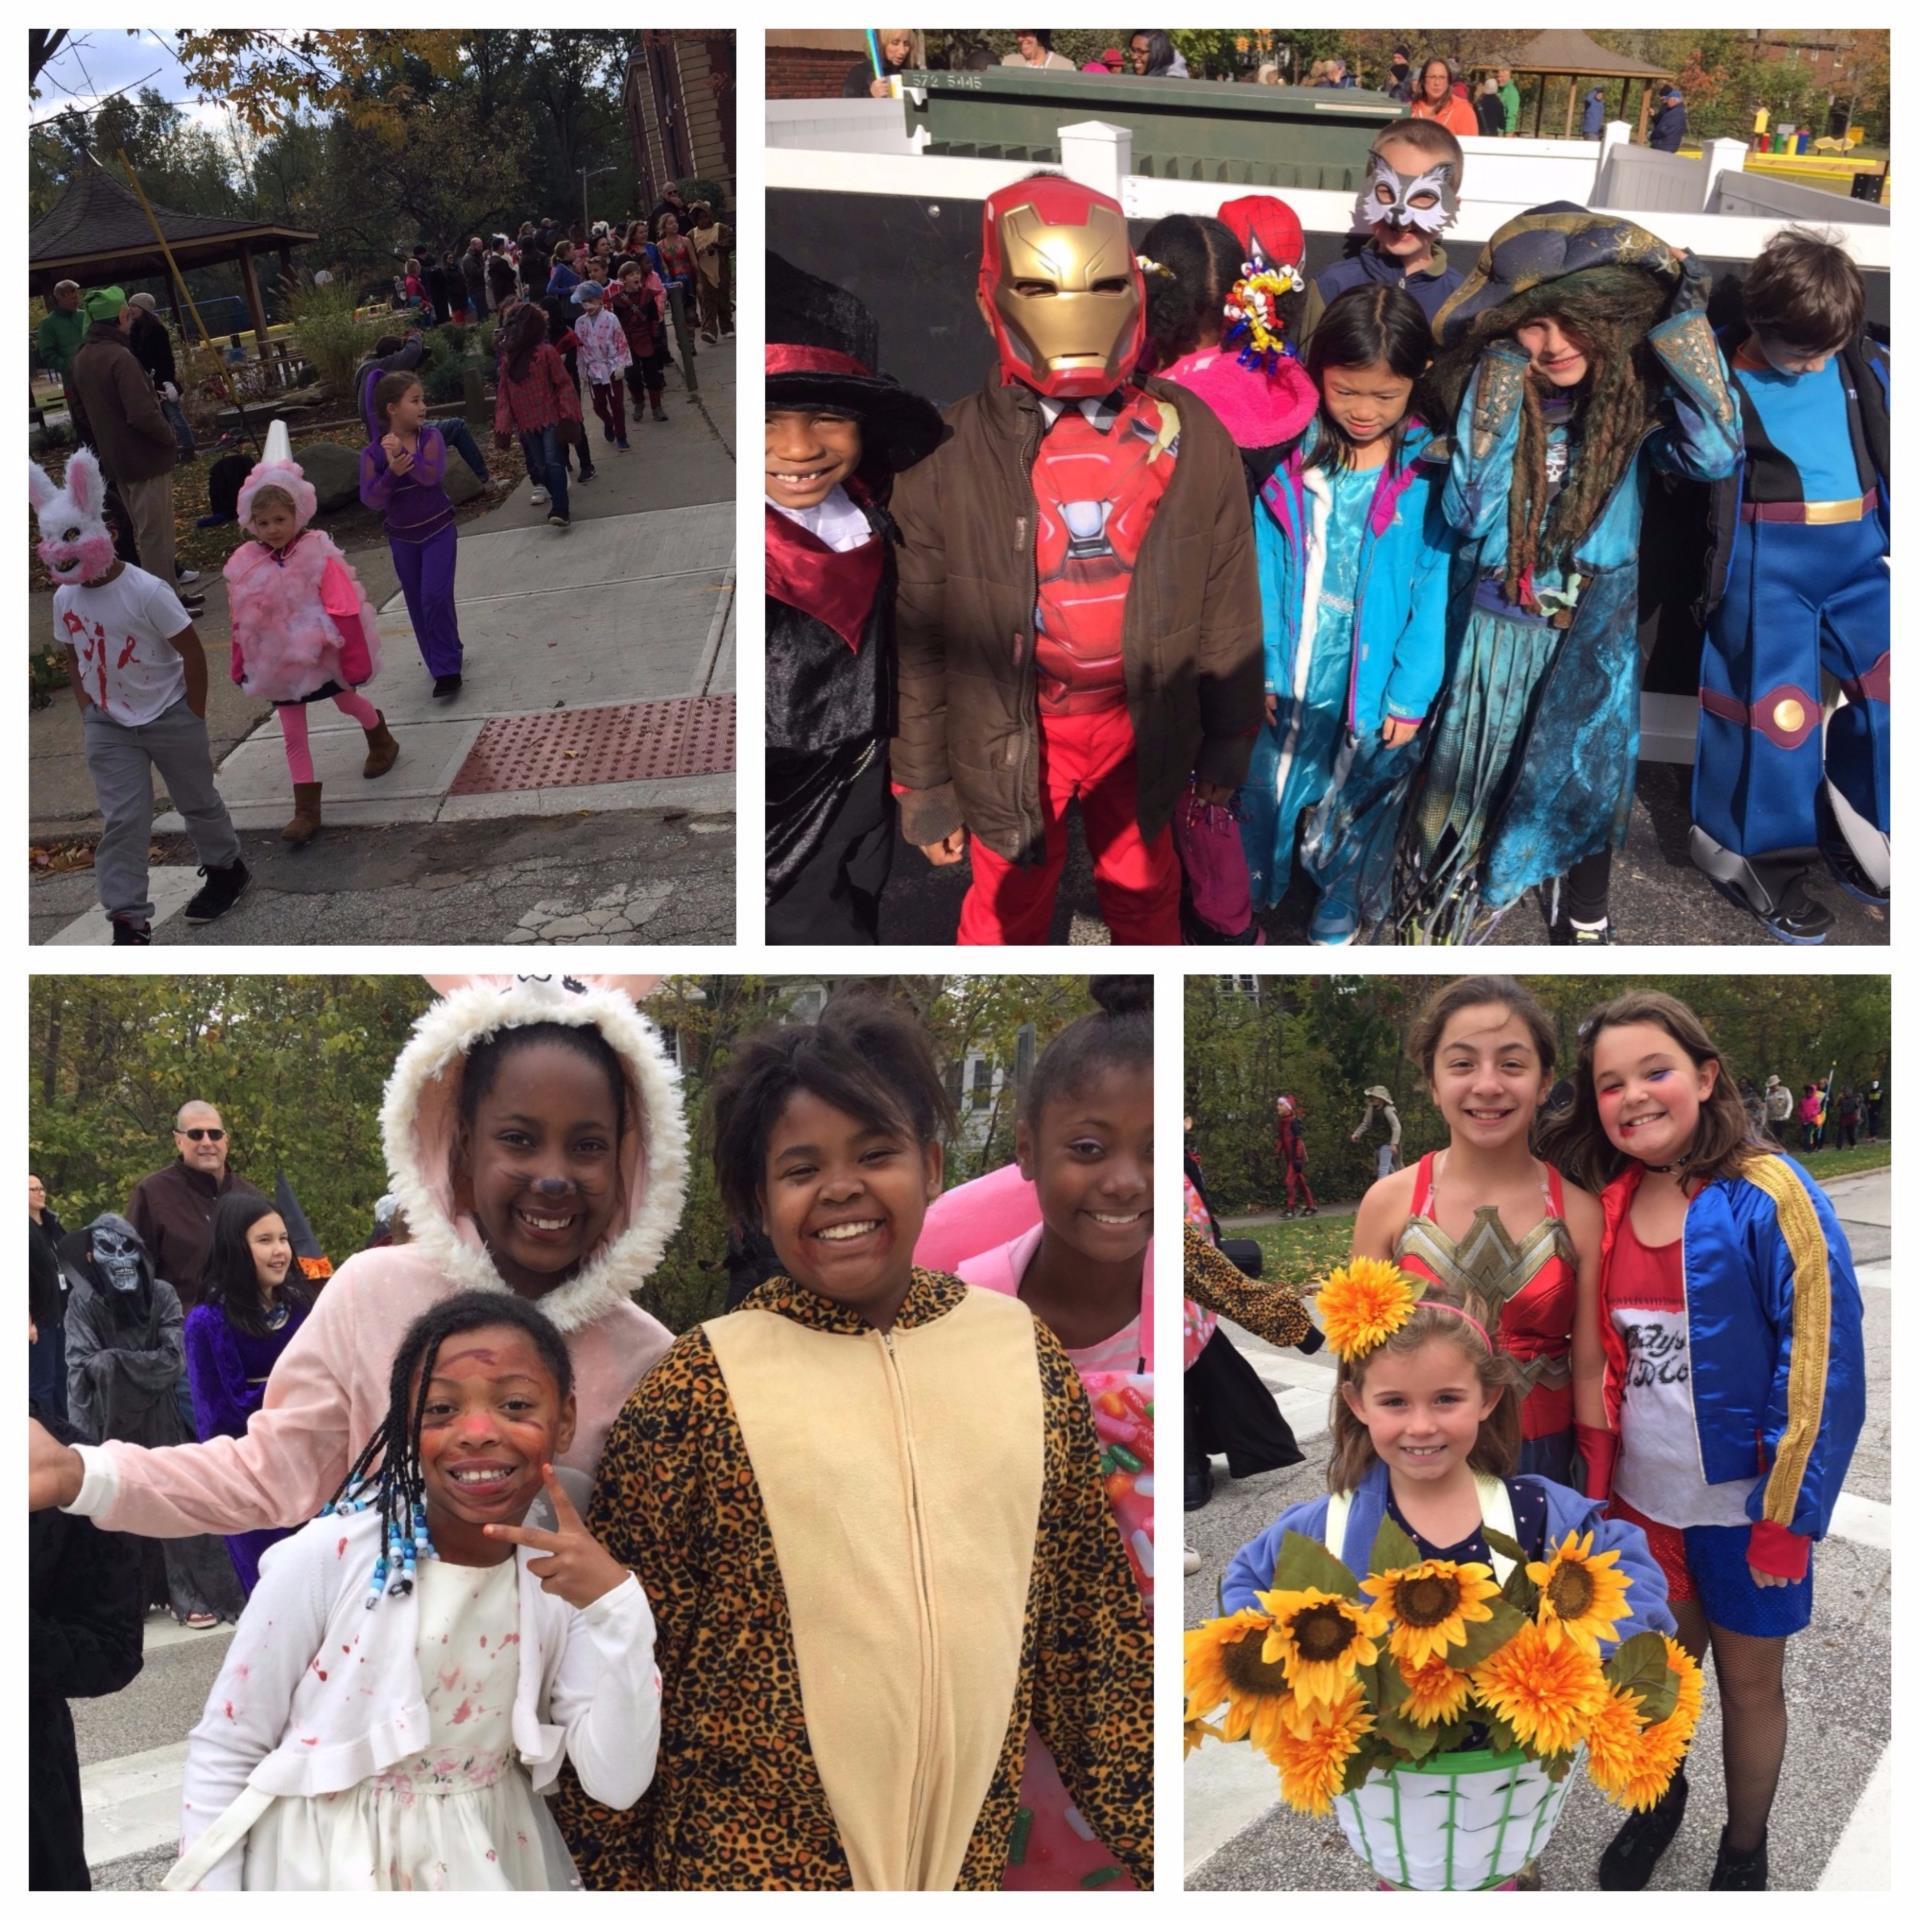 Roxboro Elementary School Halloween Costumes 2017